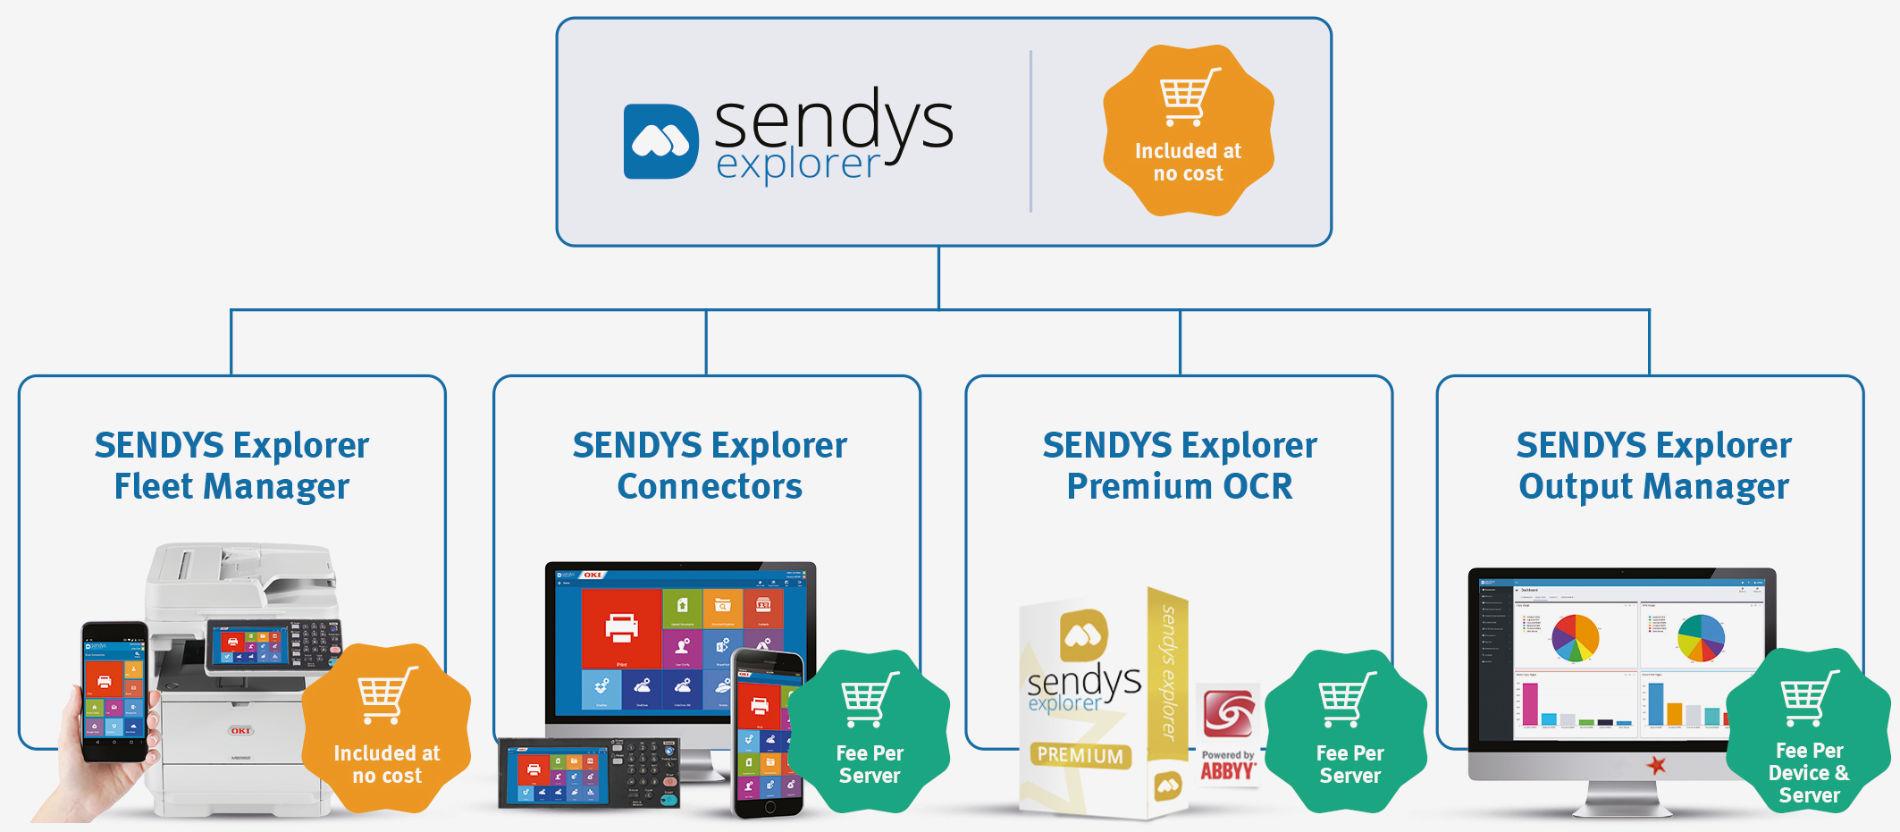 OKI Europe_Sendys_Explorer_Software_Fleet